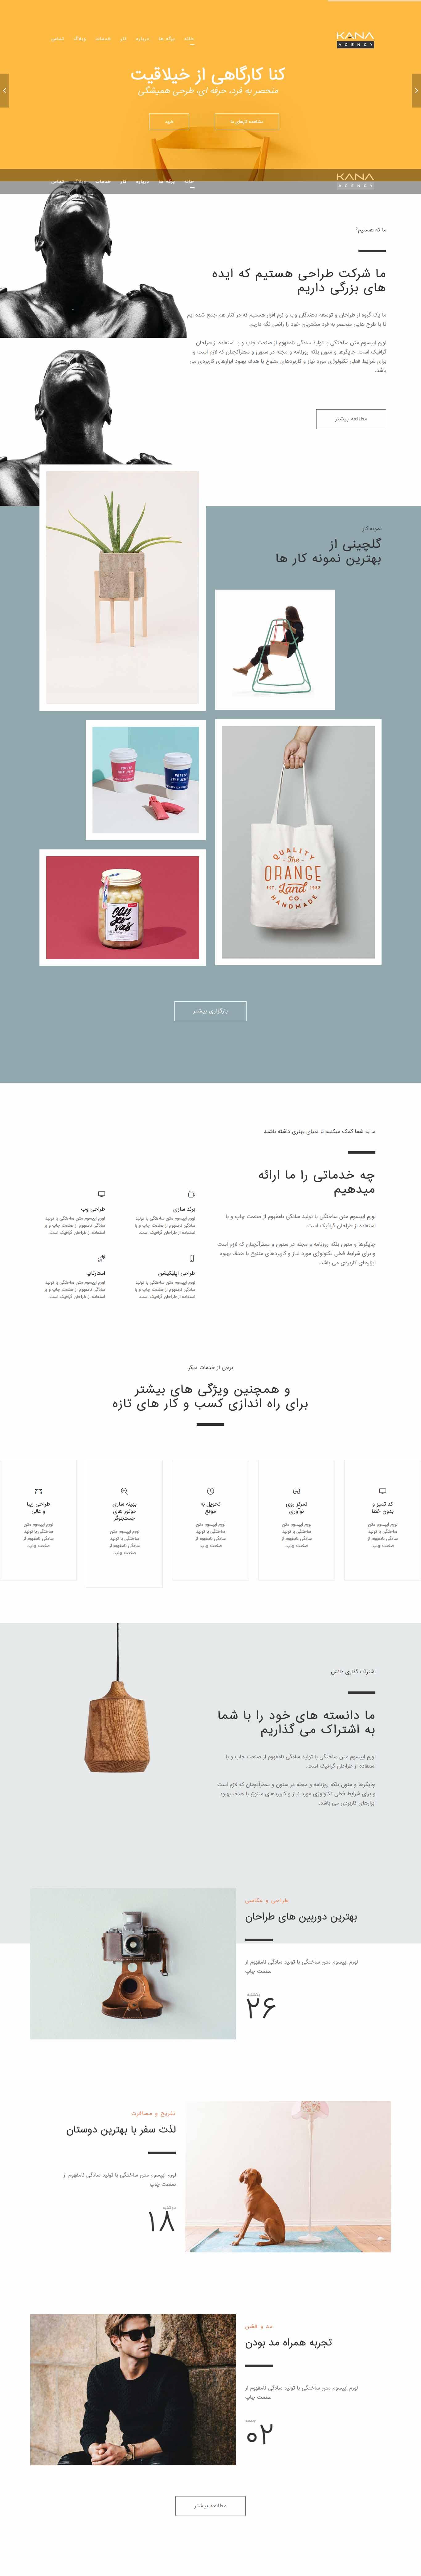 قالب KANA | قالب چندمنظوره html کانا | قالب چندمنظوره html فارسی